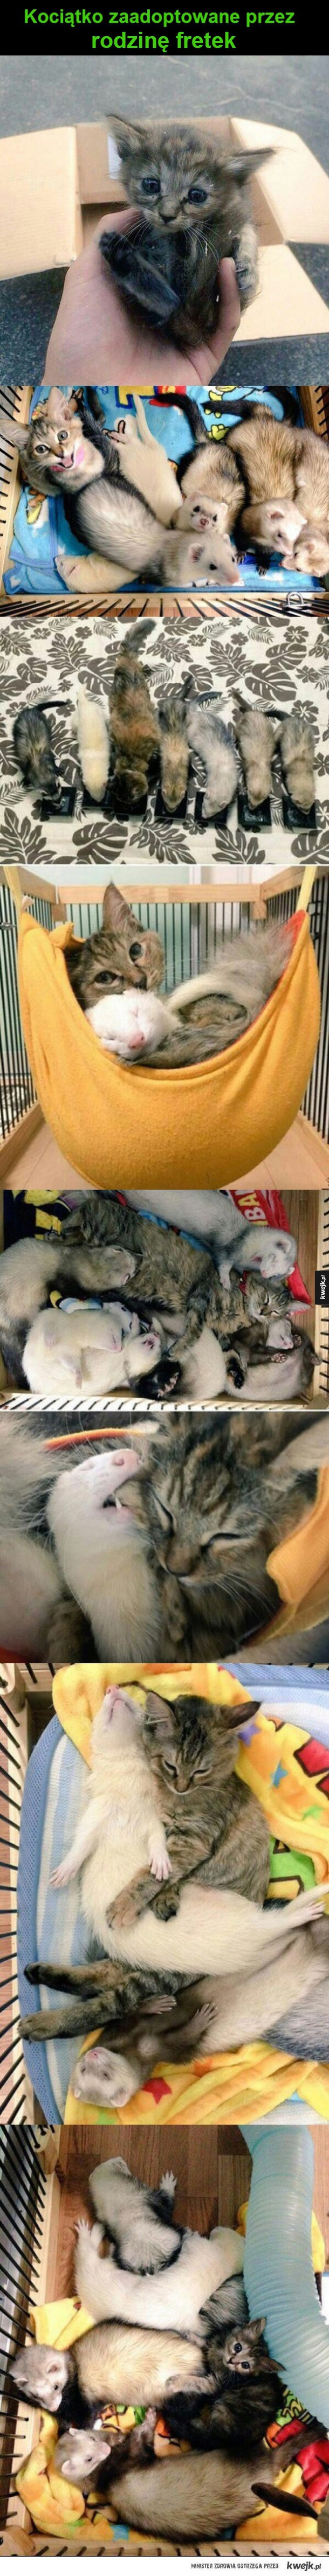 Zaadoptowany kociak